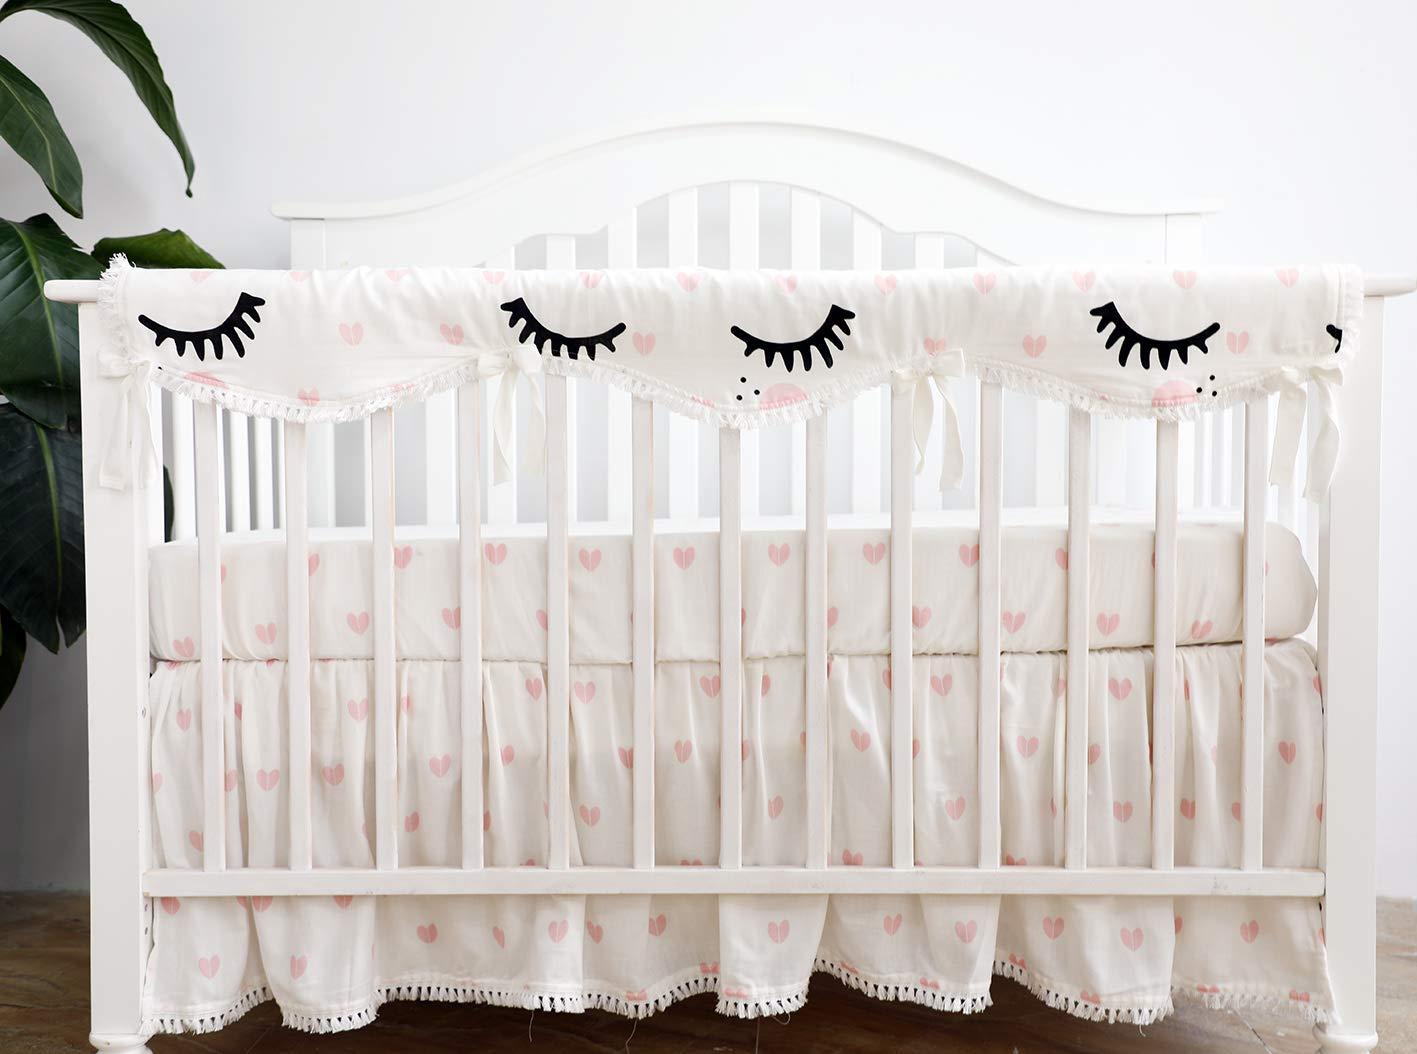 Crib Wrap For Nursery Baby Crib Crib Protector From Chewing Crib Rail Teething Guard Long Rail Cover X 1 Trojan Horse Sahaler Crib Rail Cover Rail Covers